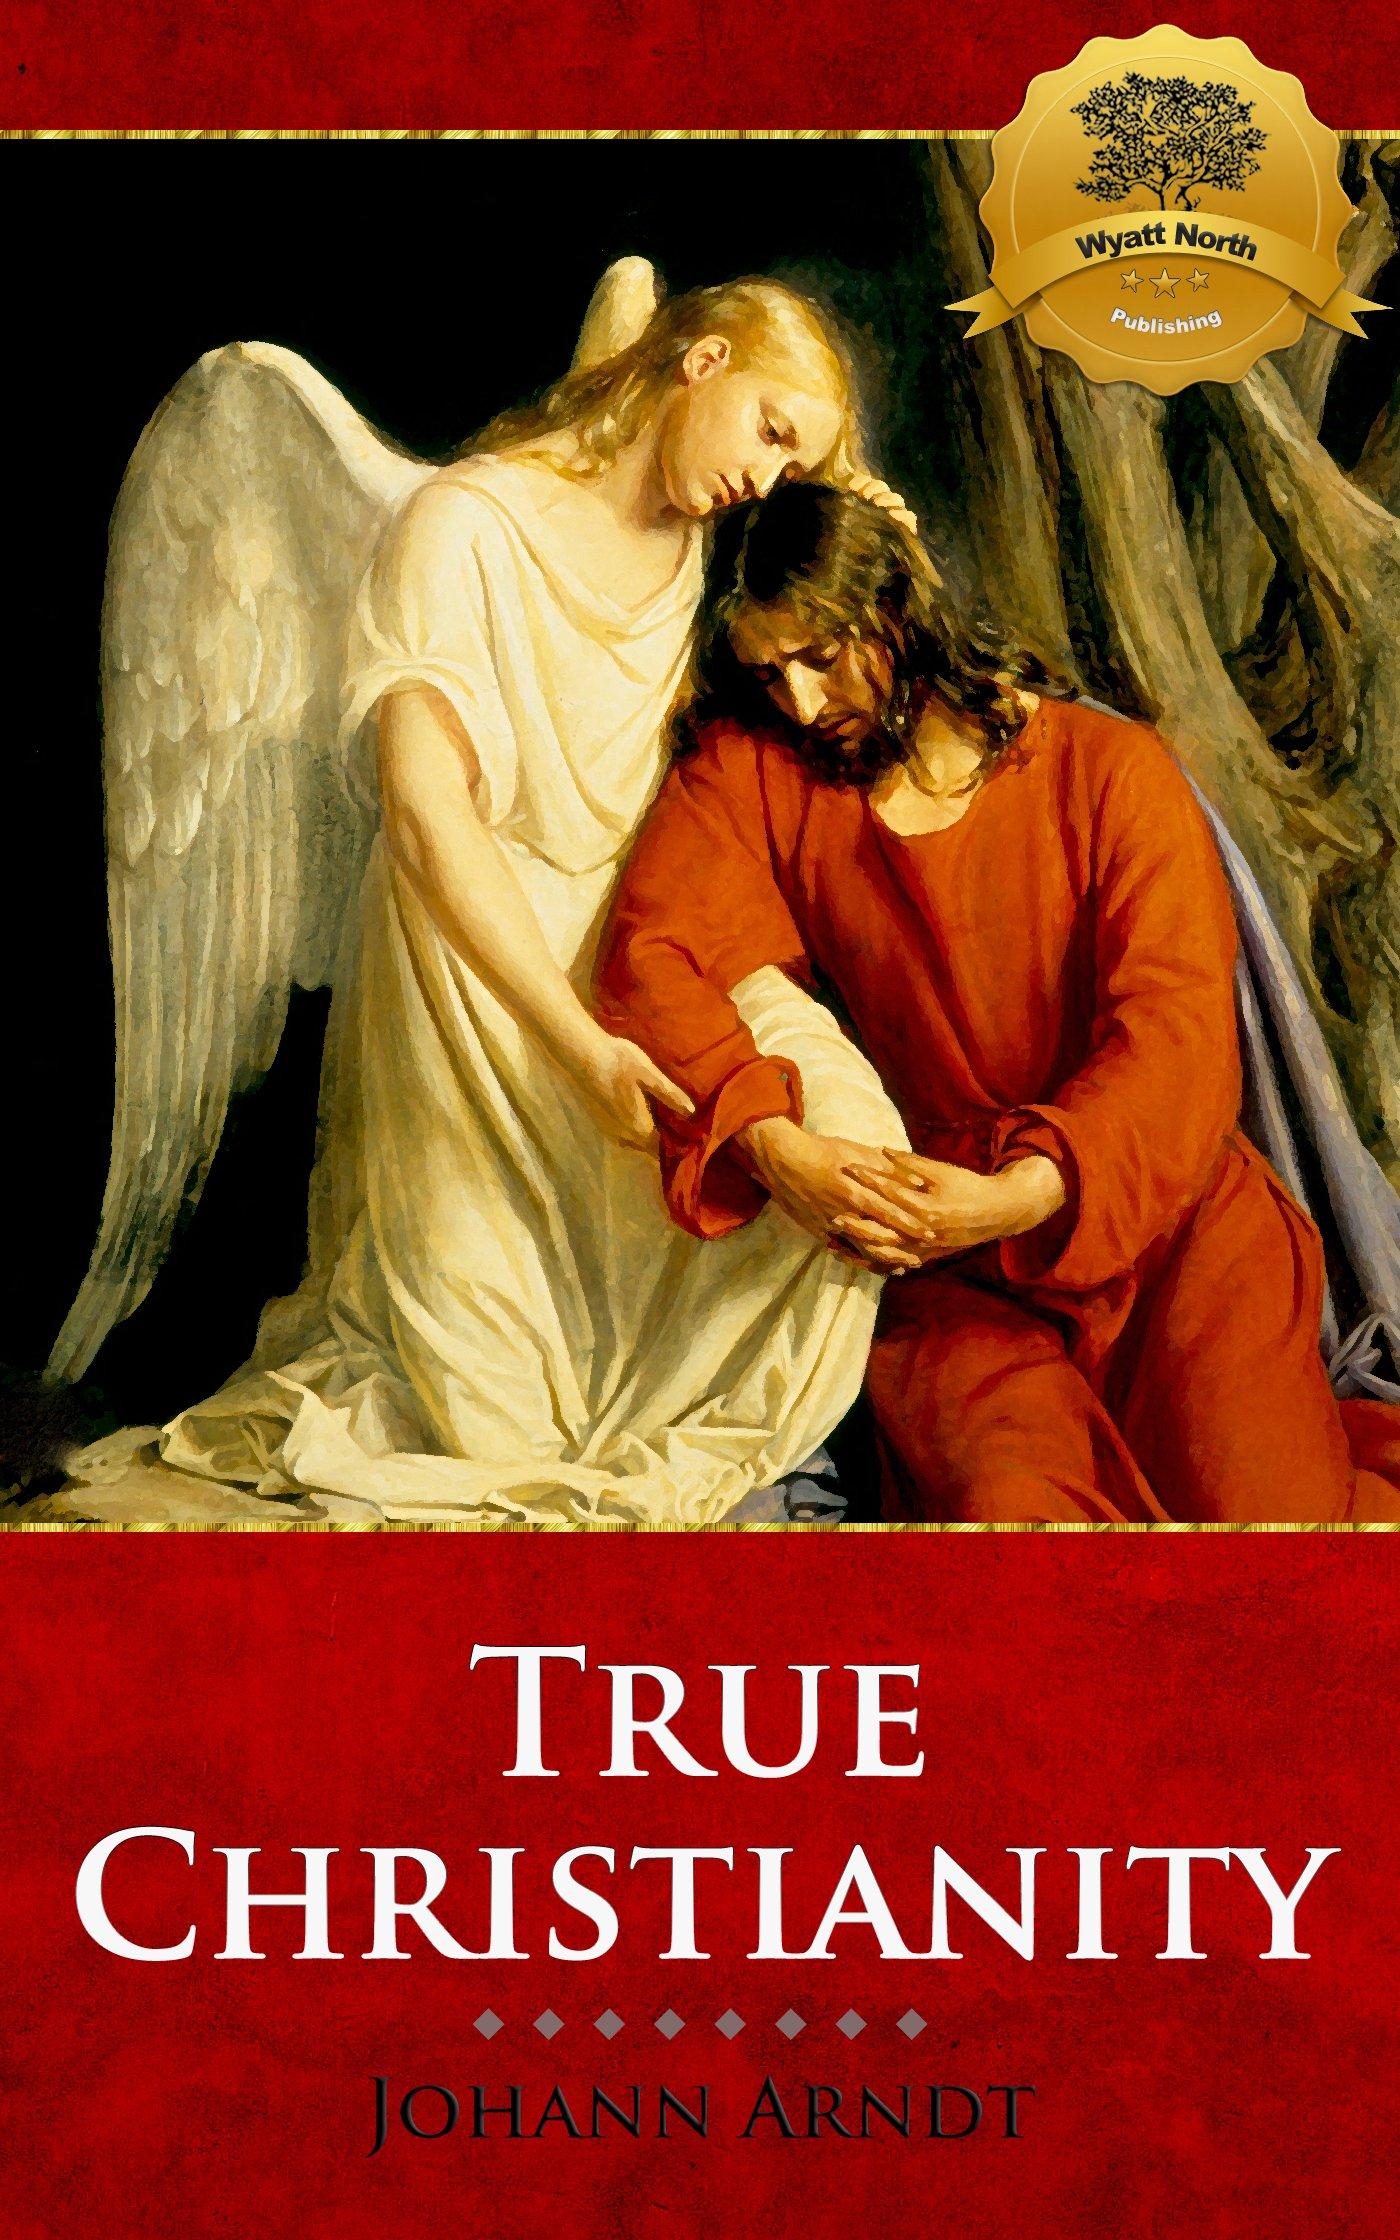 True Christianity (Illustrated) - Enhanced